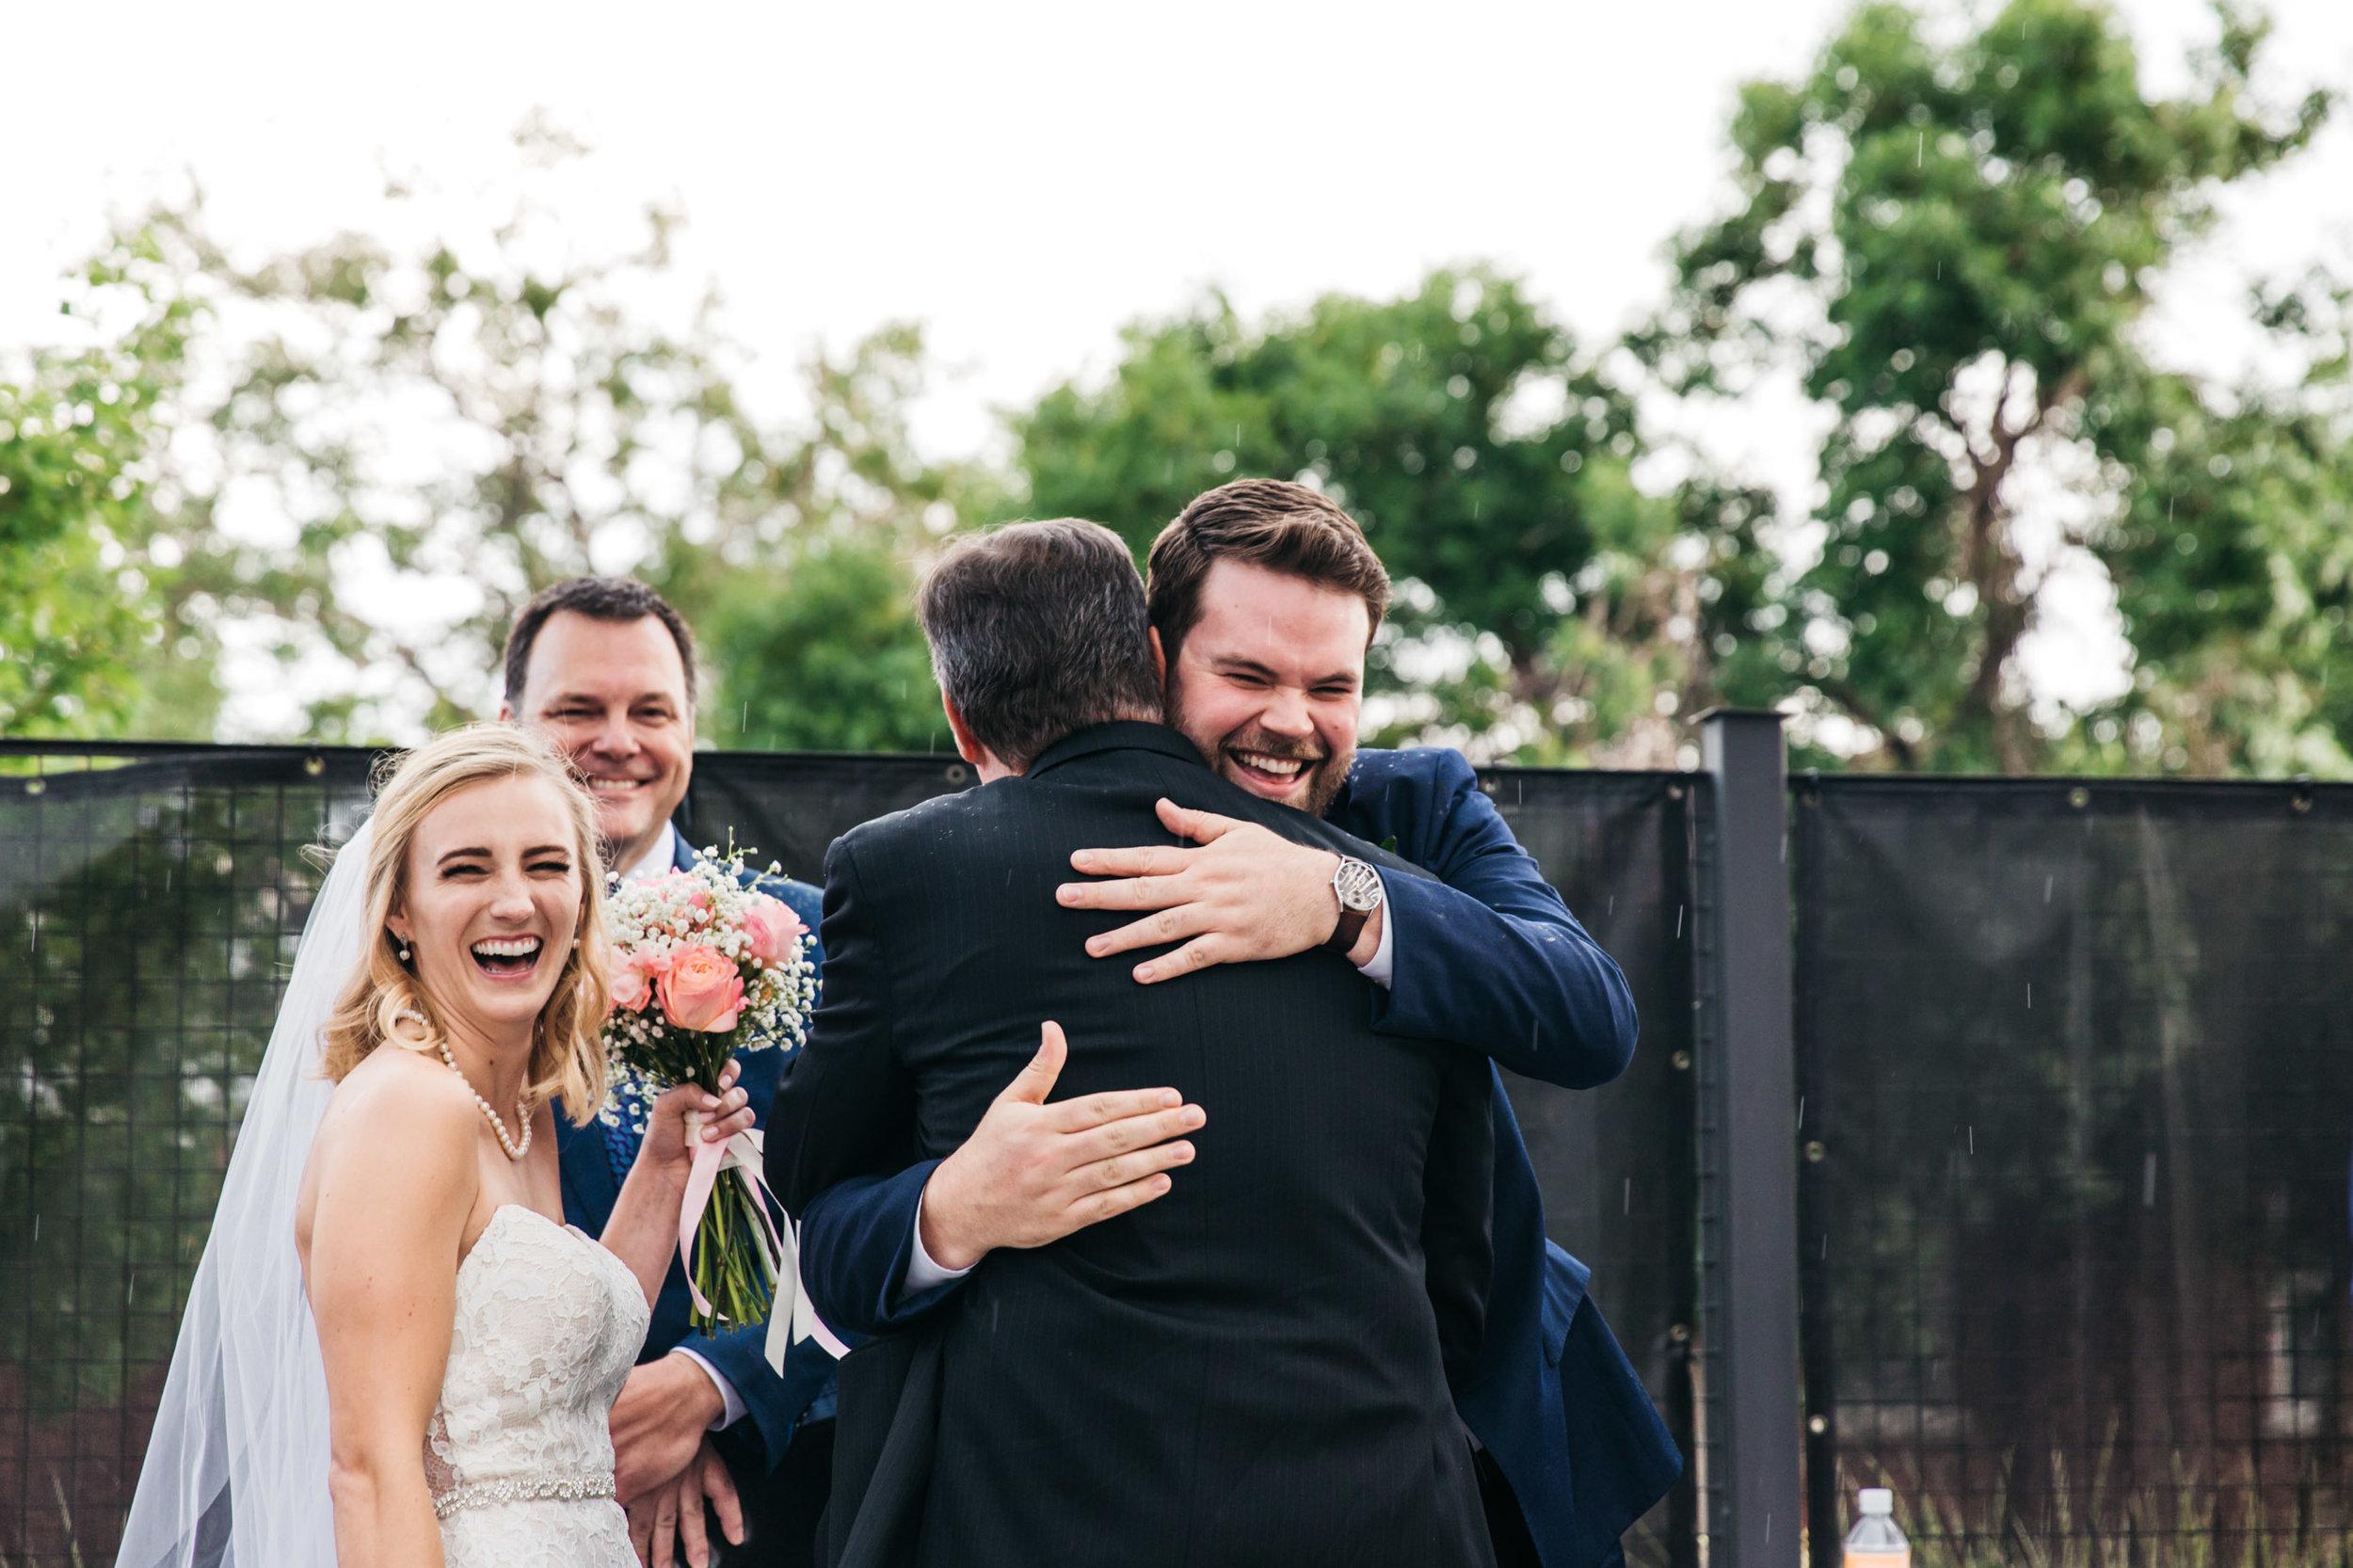 Hugs denver wedding photographer